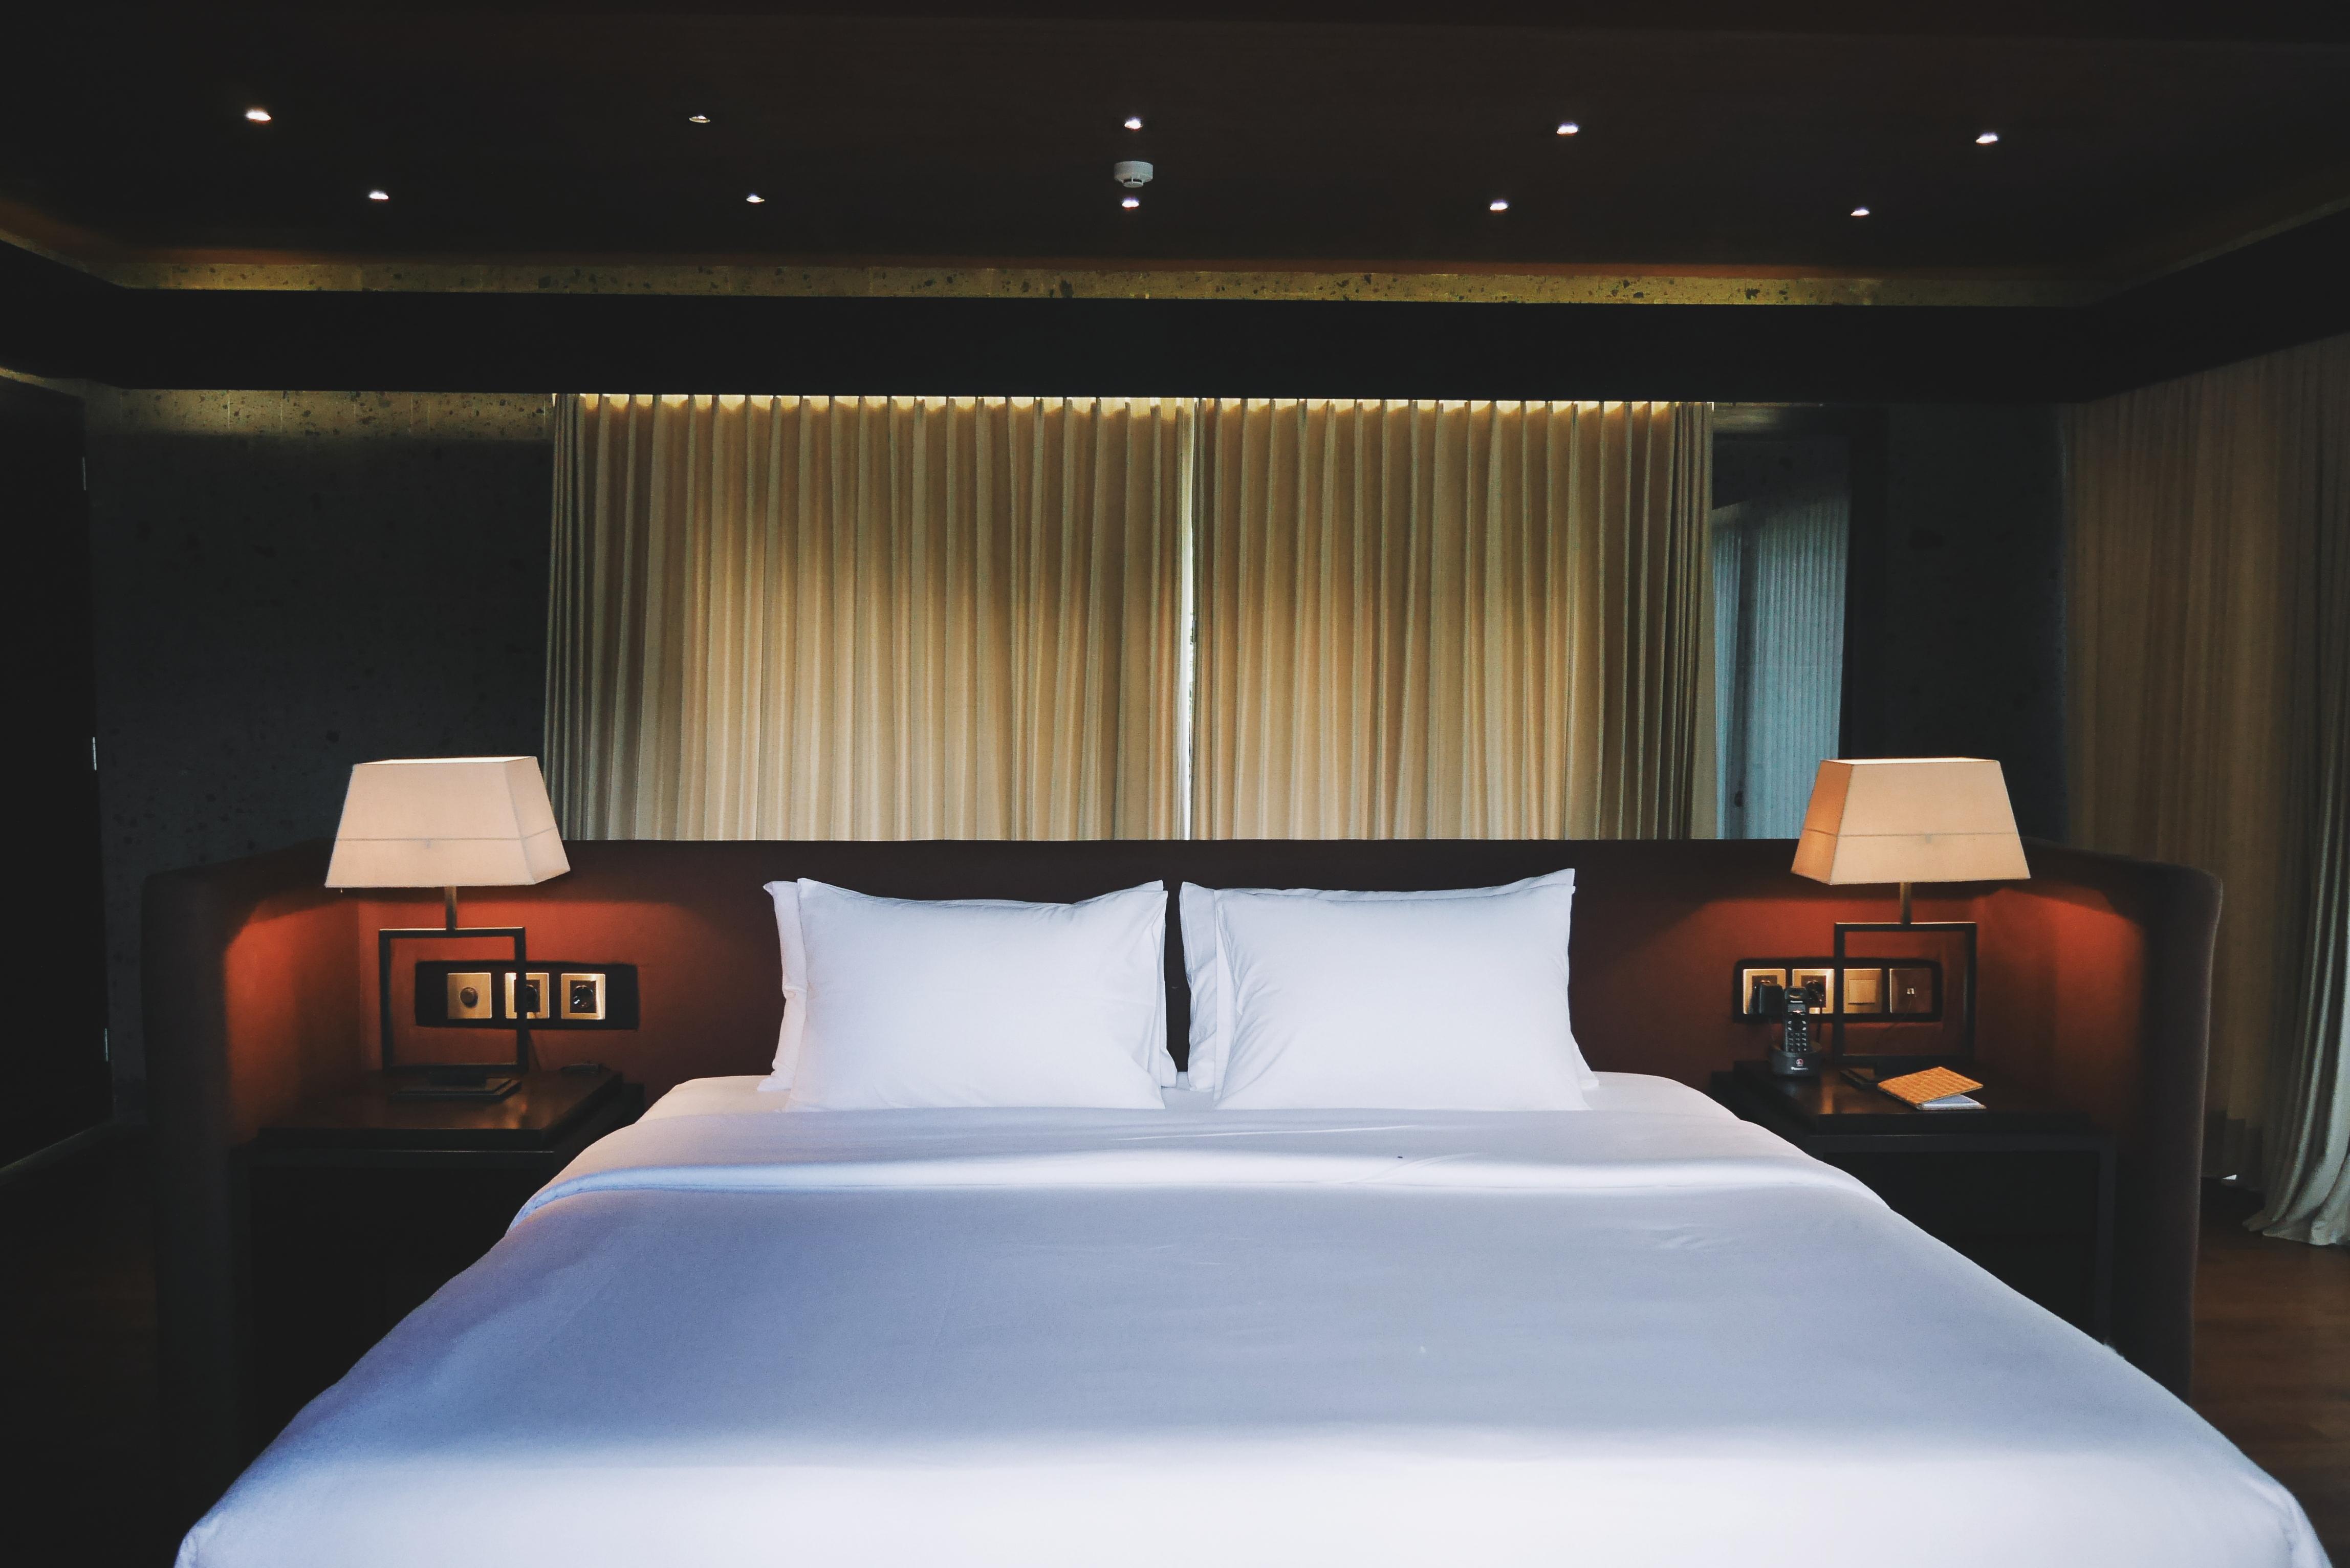 Tempat Tidur tanpa sekat di belakang nya